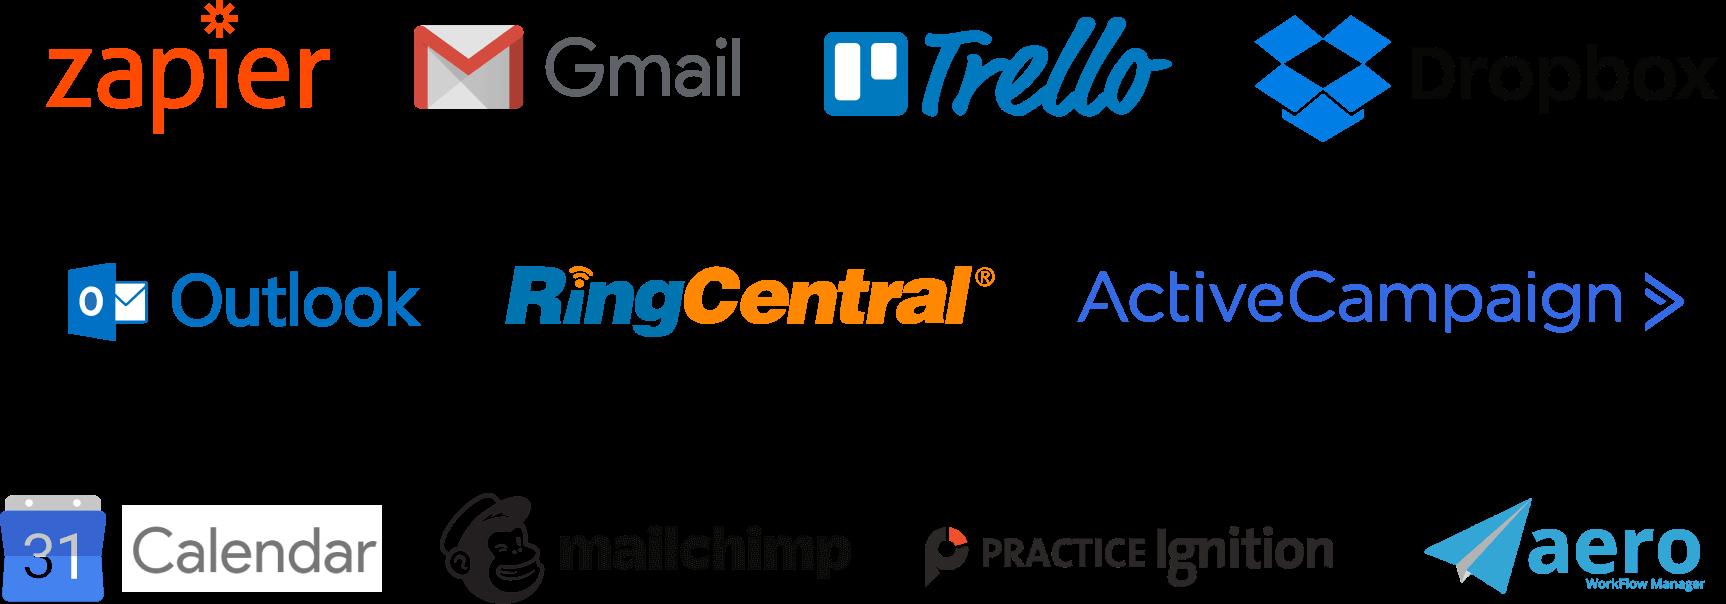 Image of multiple app logos